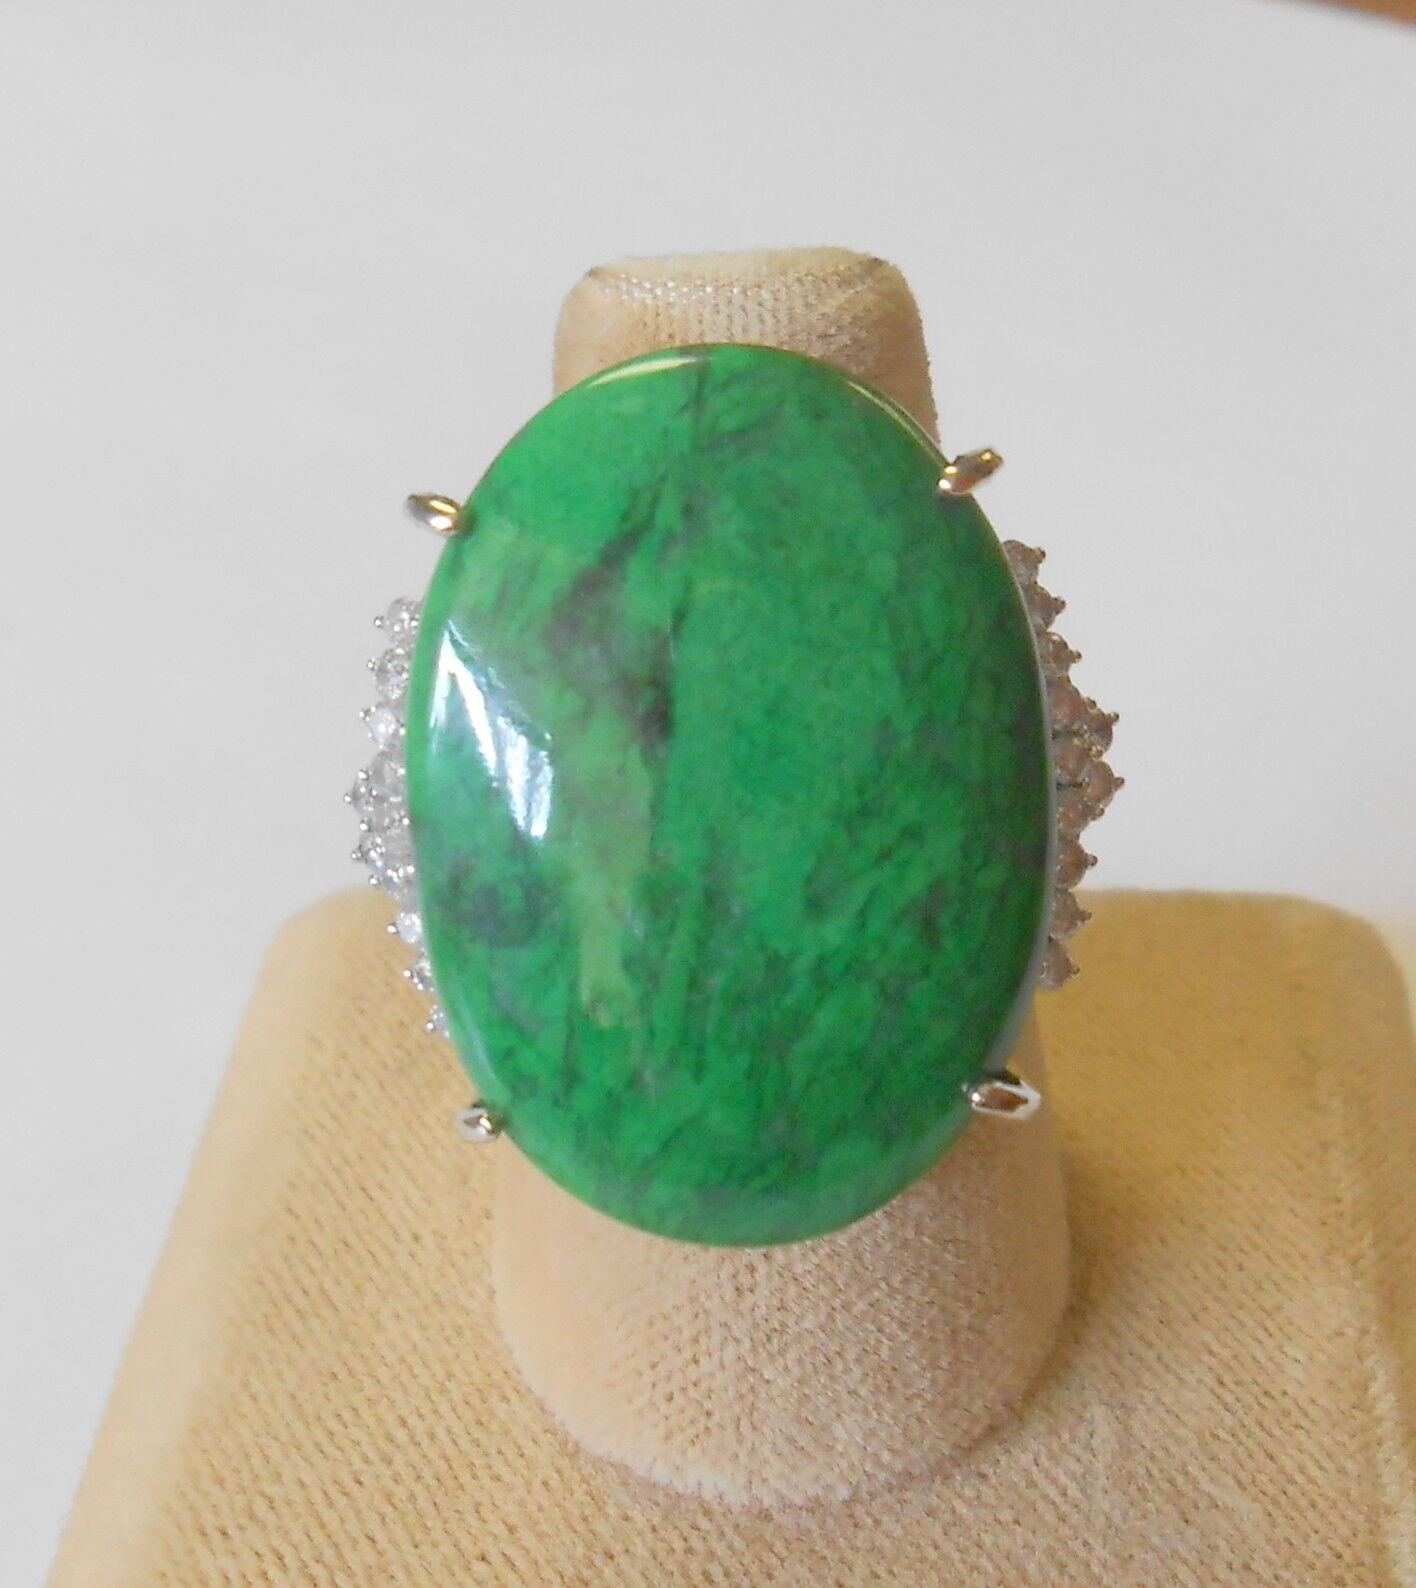 Exceptional 14K White gold Filigree 22 Diamonds Green Apple Sitt Jade Ring 6.75